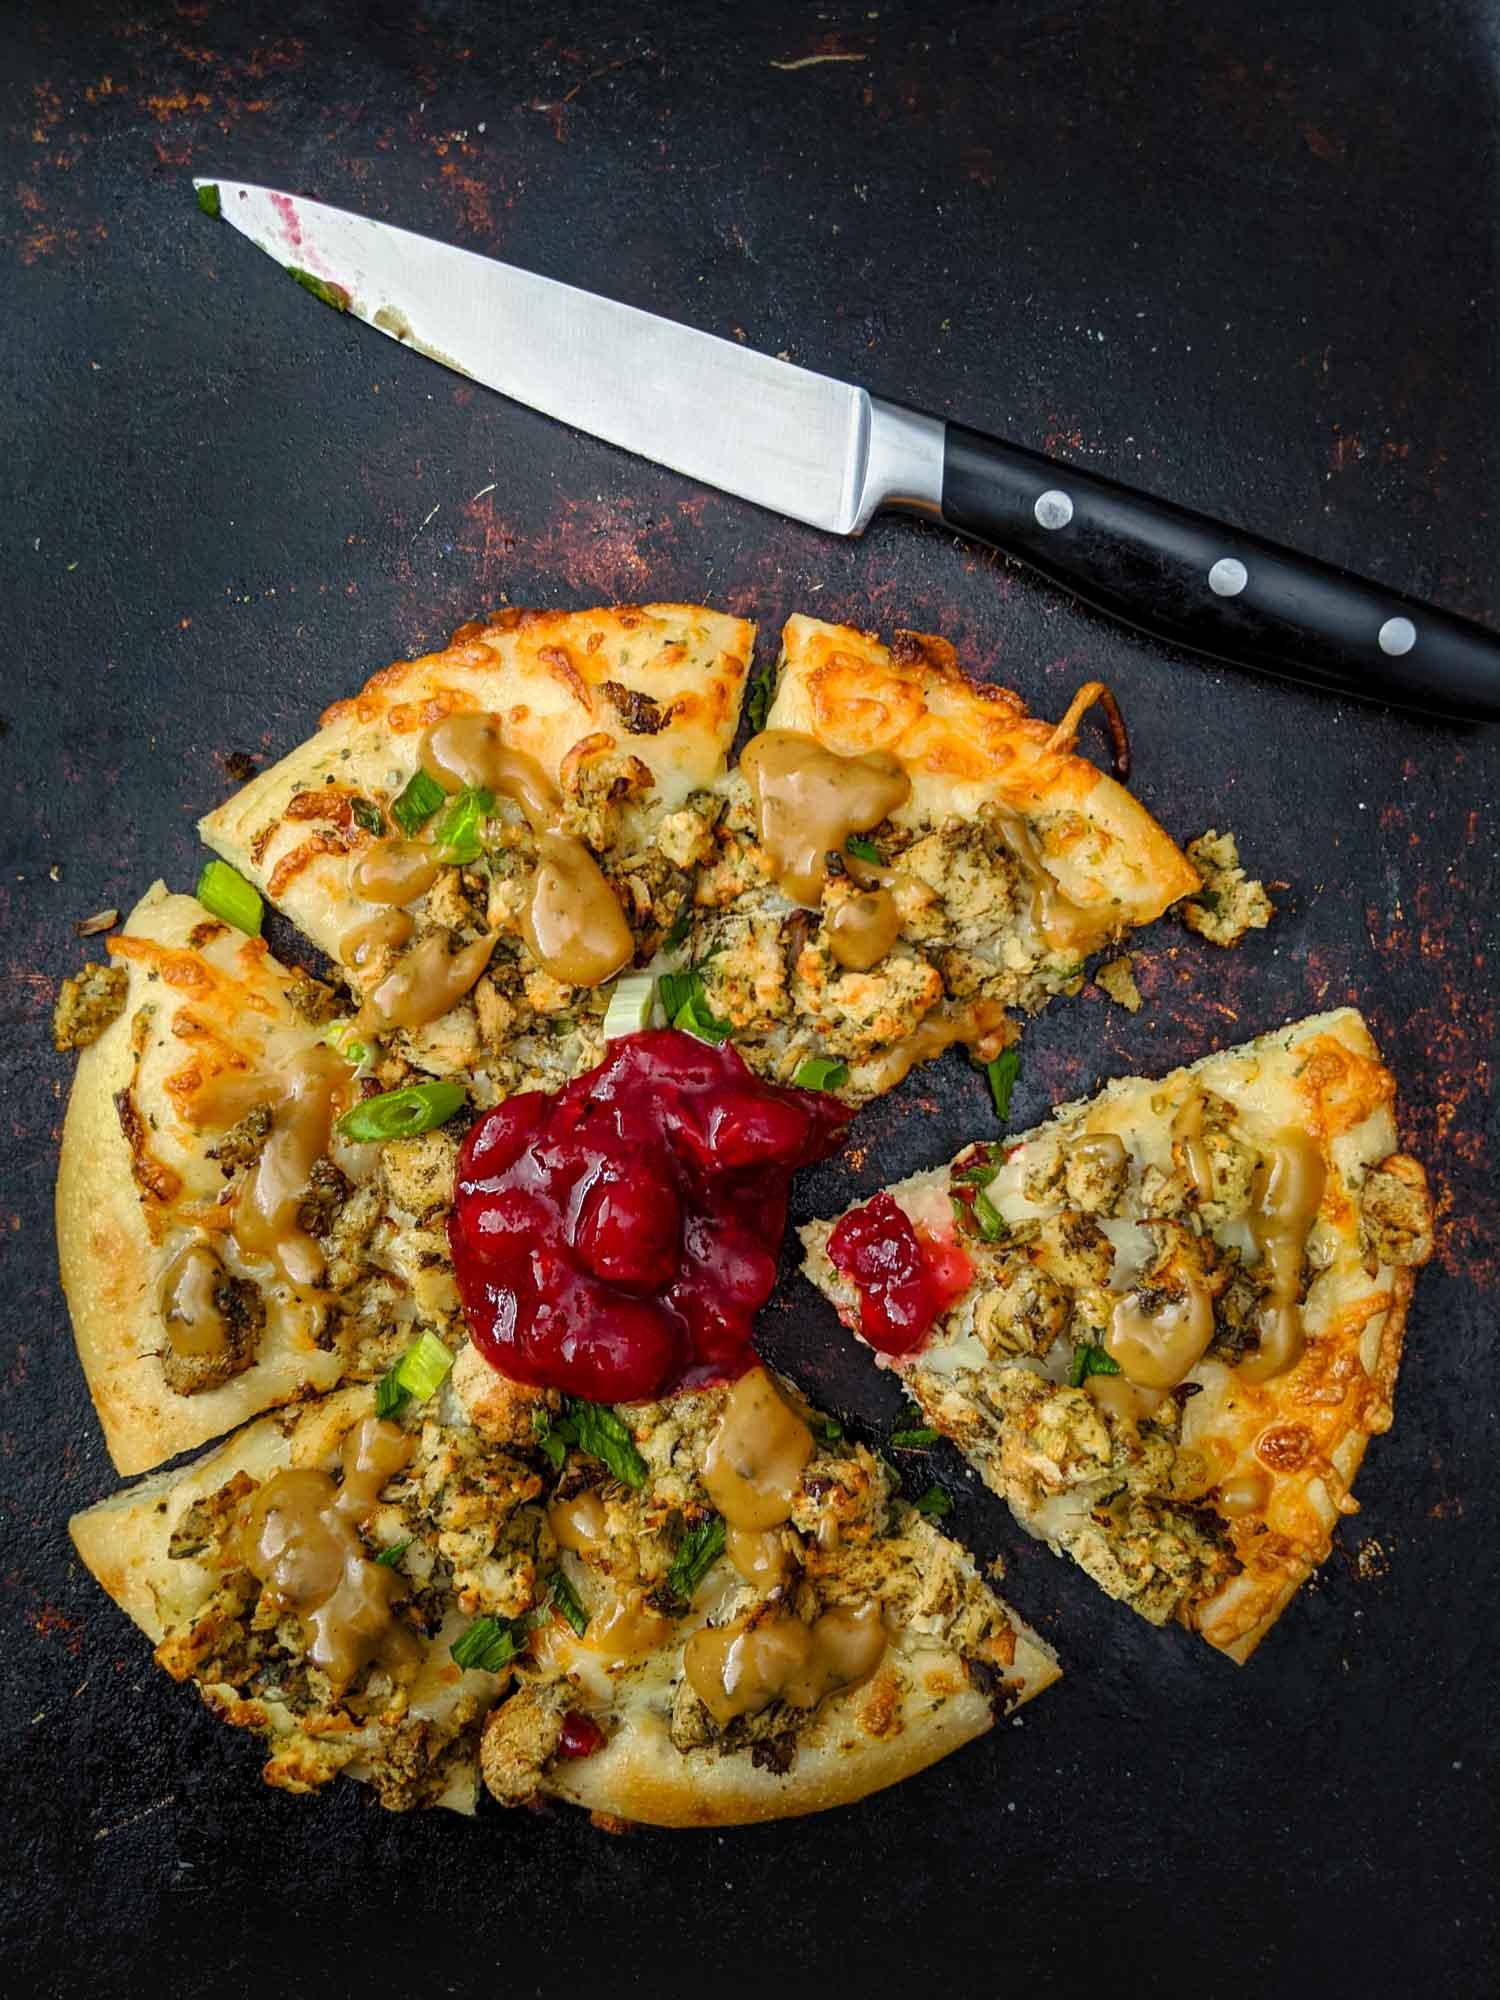 Thanksgiving pizza using turkey dinner leftovers on black.